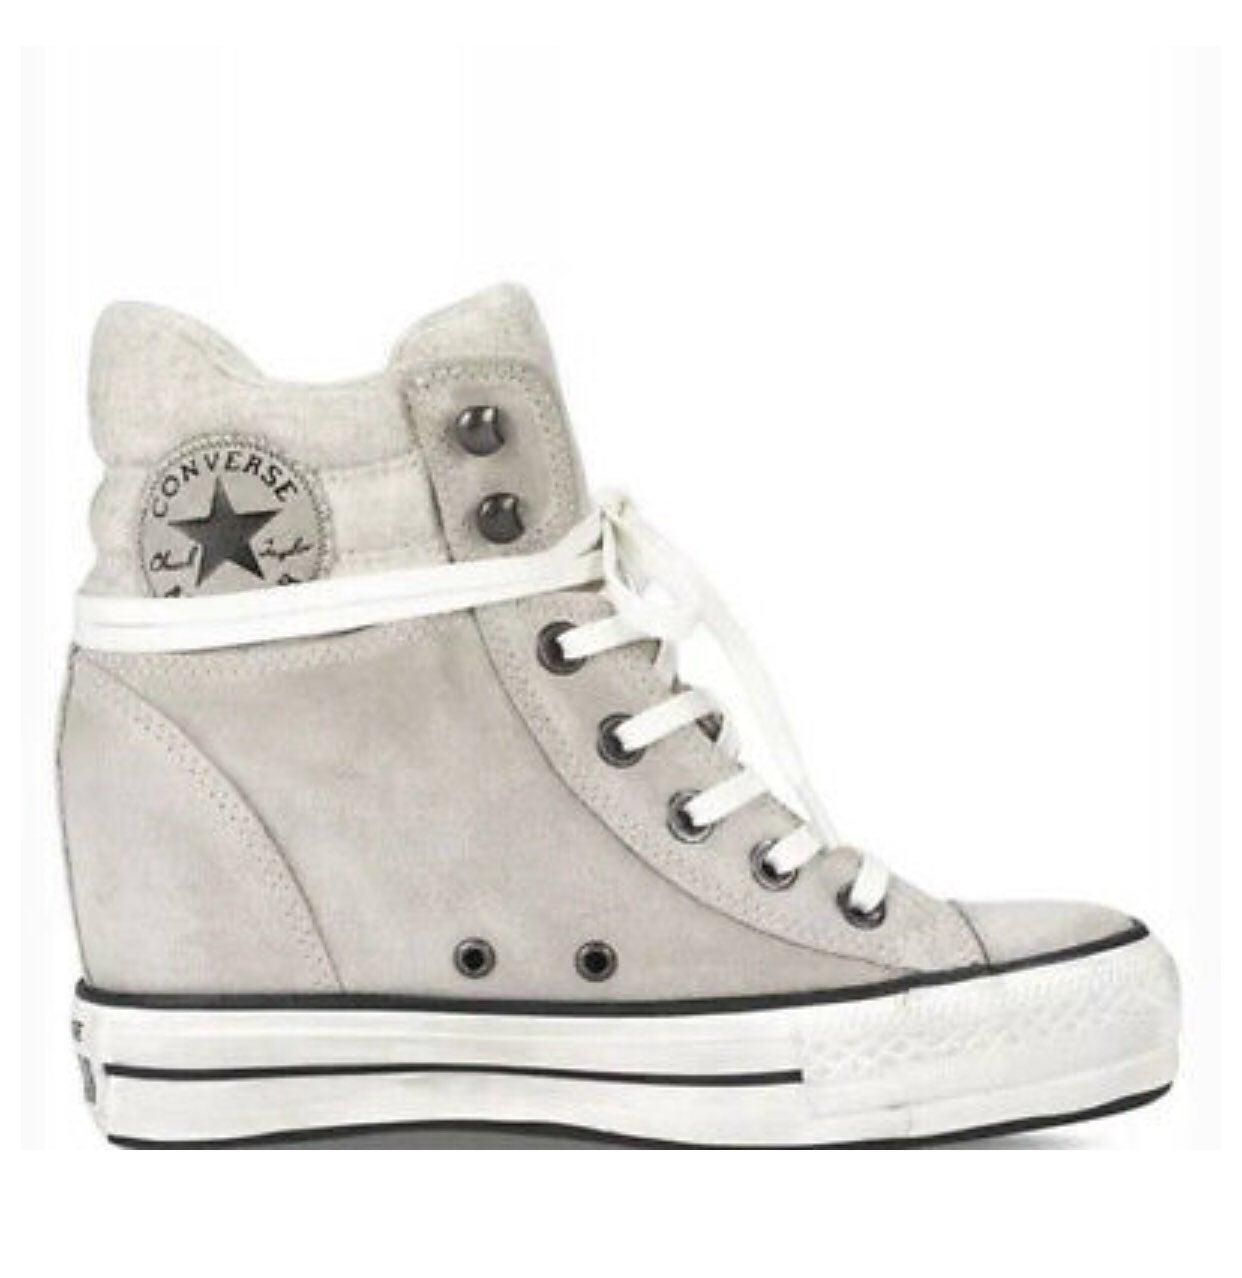 Converse Platform Wedge Shoes | Mercari